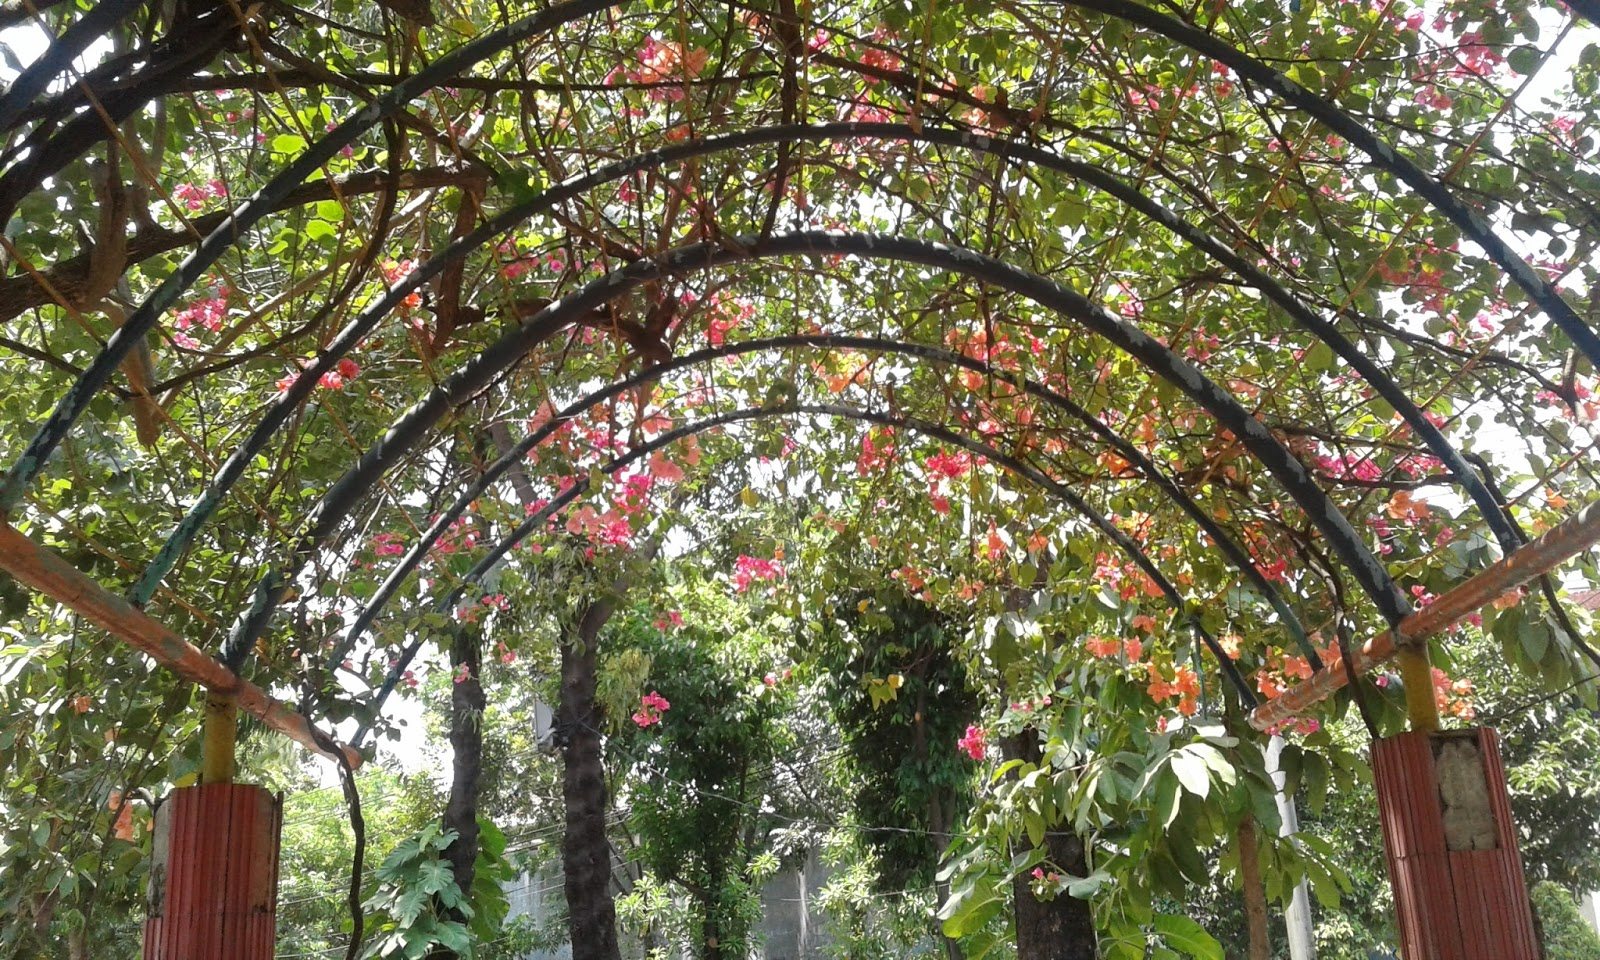 Hmmm Cantiknya Taman Prestasi Surabaya Catatan Harian Qc Inspector Kota